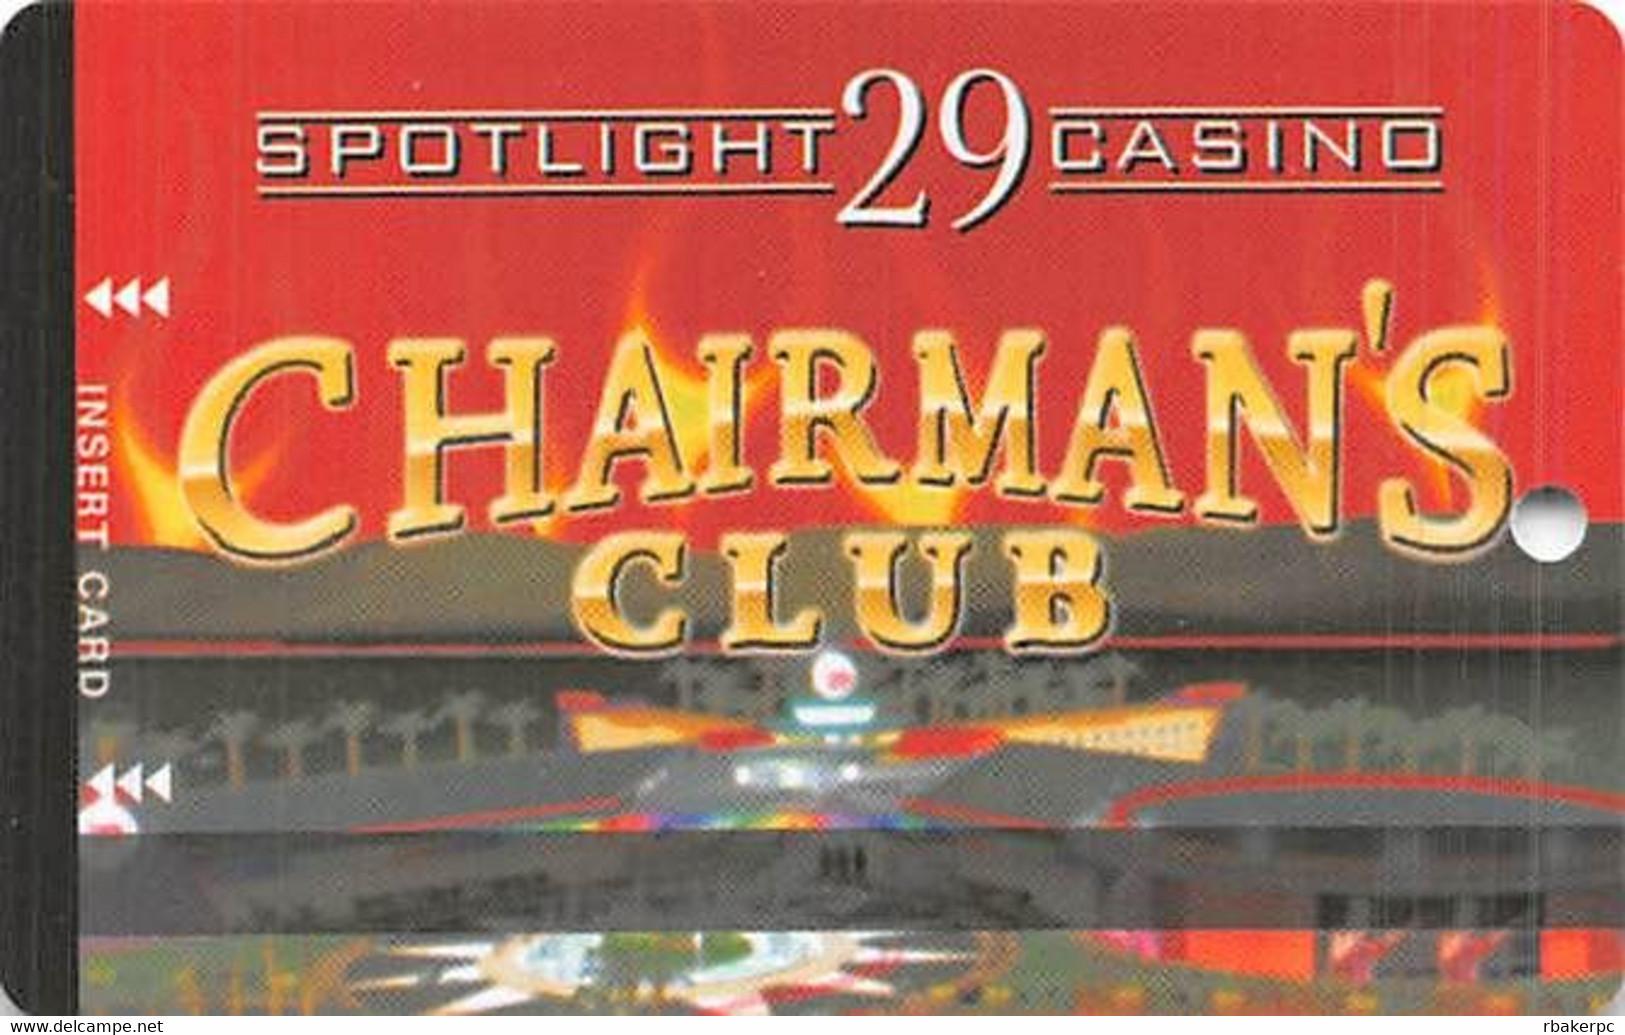 Spotlight 29 Casino - Coachella, CA USA - BLANK Slot Card - Casino Cards